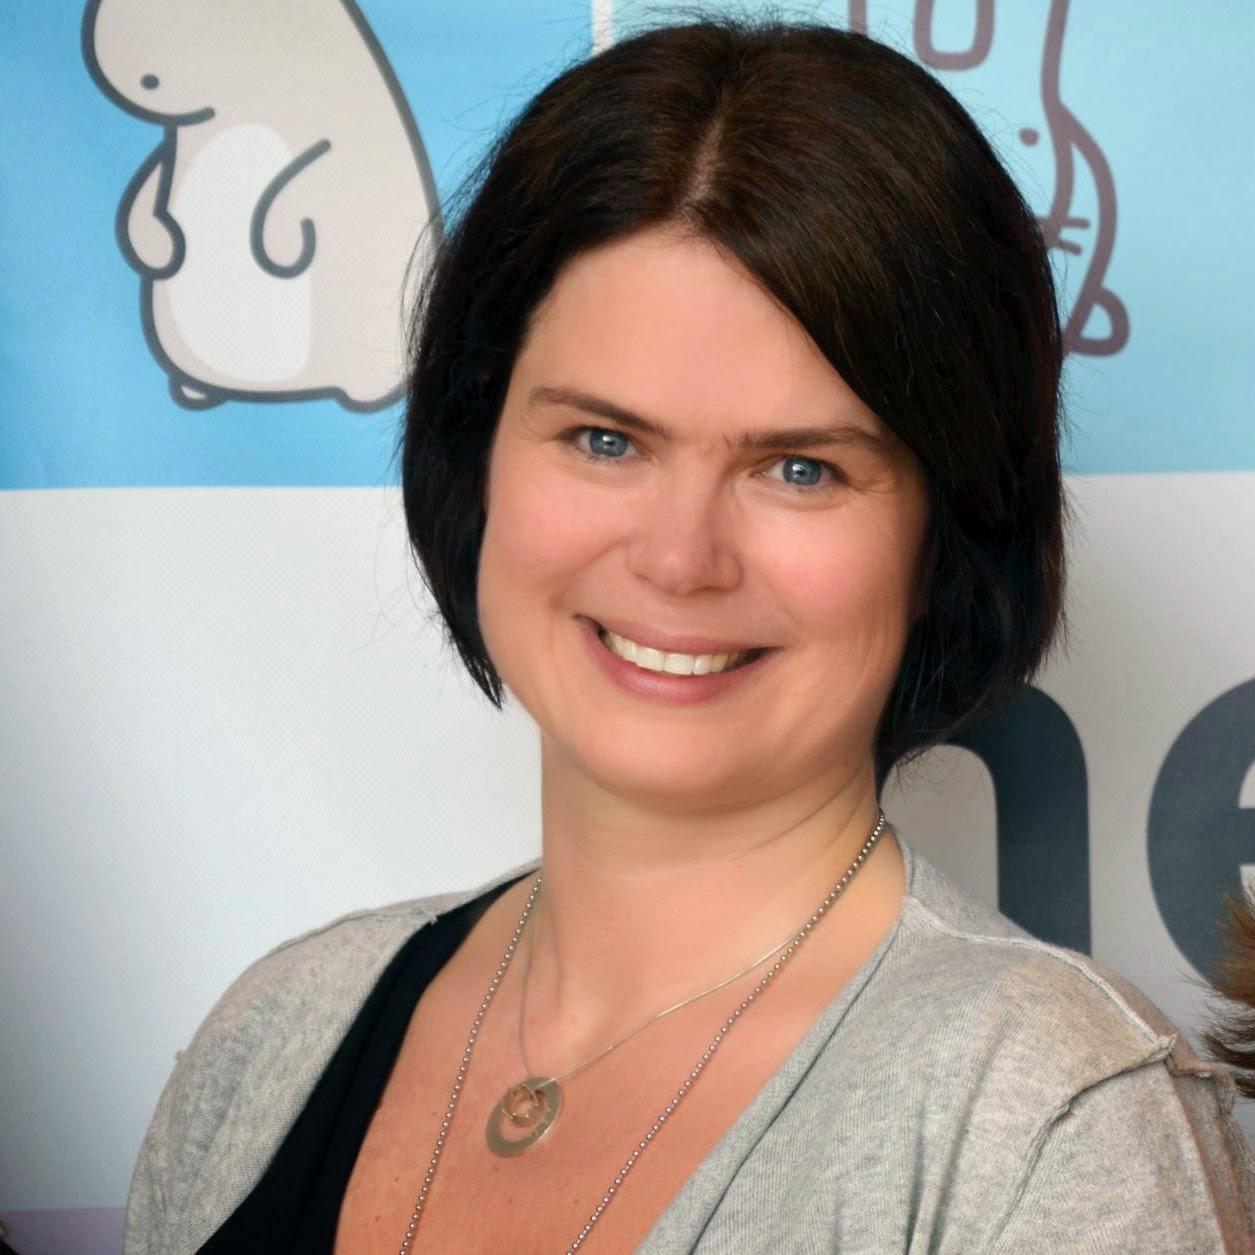 meandi Interview Carina Josefsson Runzelfuesschen